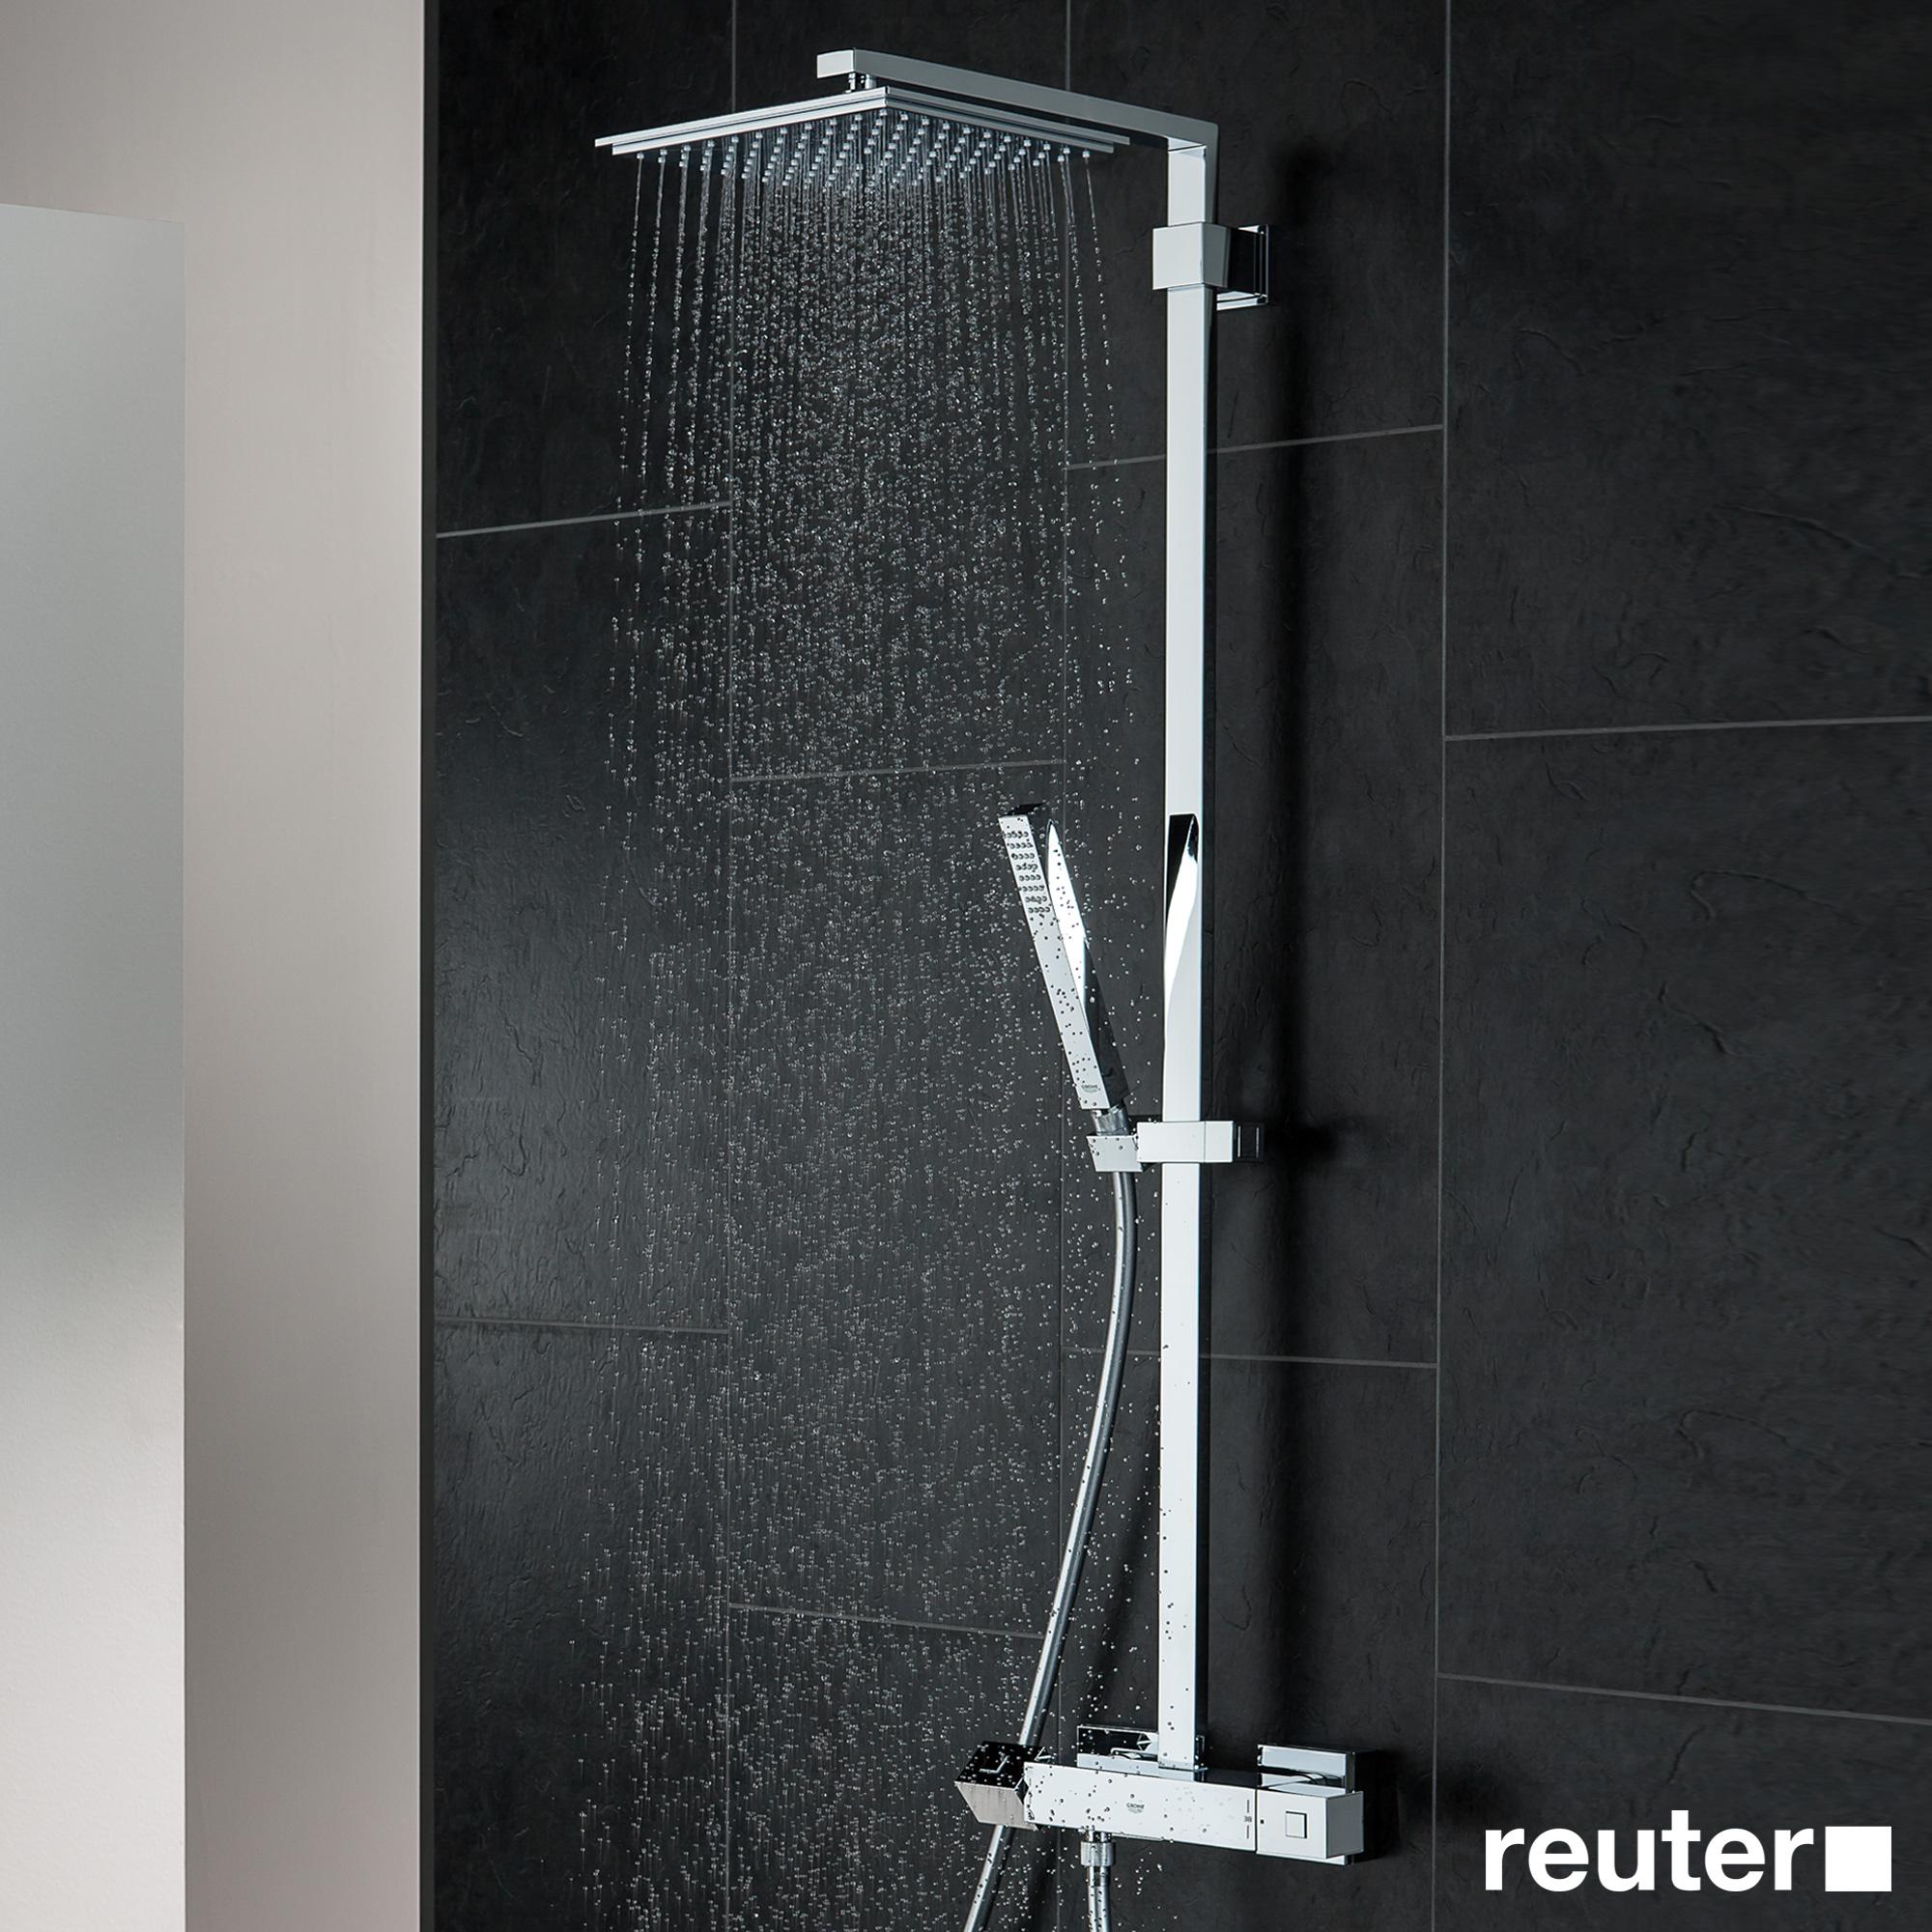 grohe euphoria cube xxl system 230 duschsystem mit thermostatbatterie f r die wandmontage. Black Bedroom Furniture Sets. Home Design Ideas